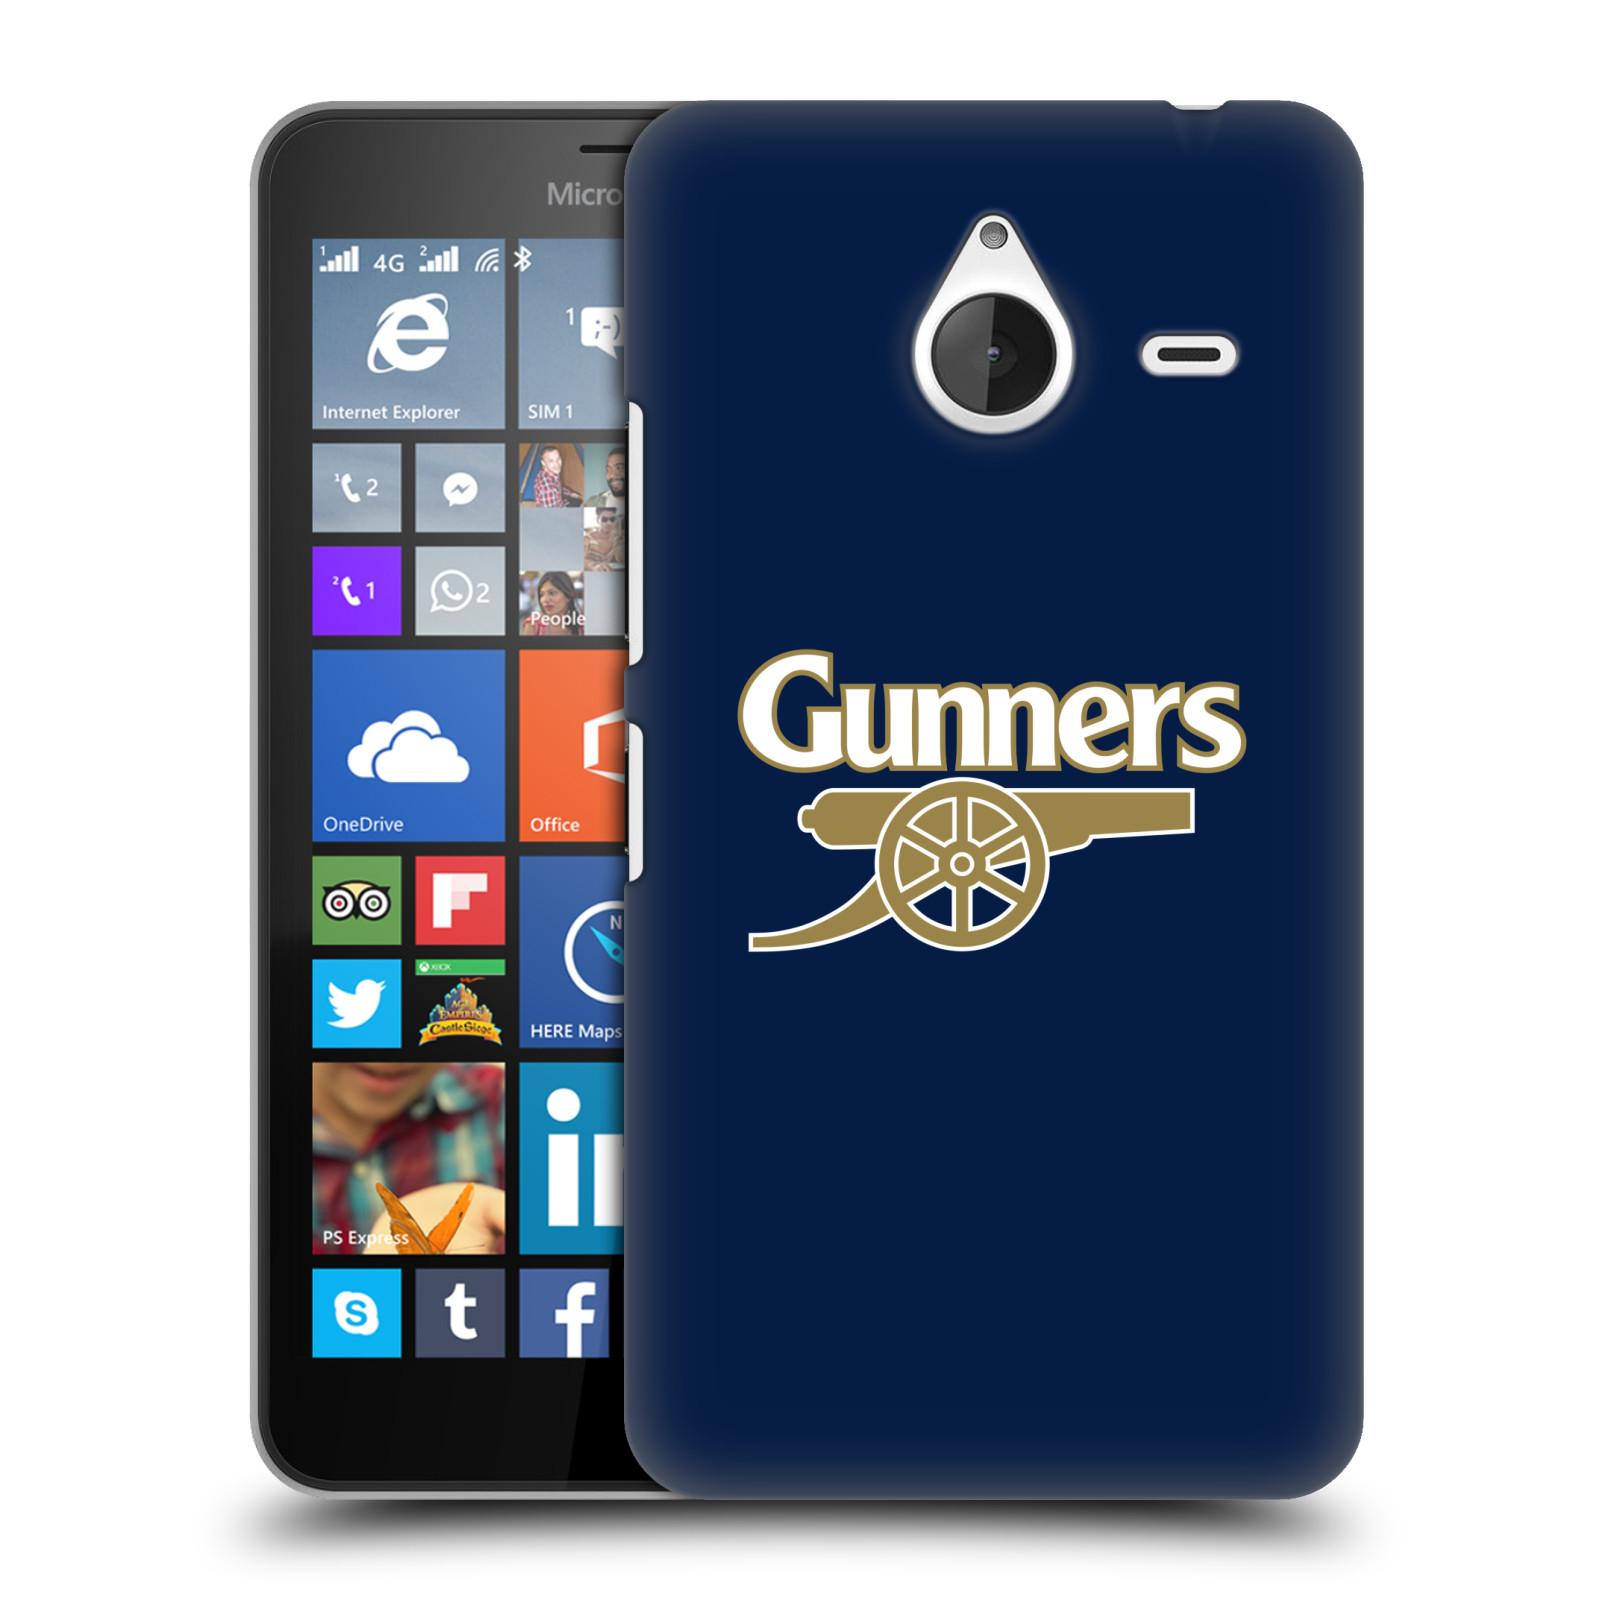 Plastové pouzdro na mobil Microsoft Lumia 640 XL - Head Case - Arsenal FC - Gunners